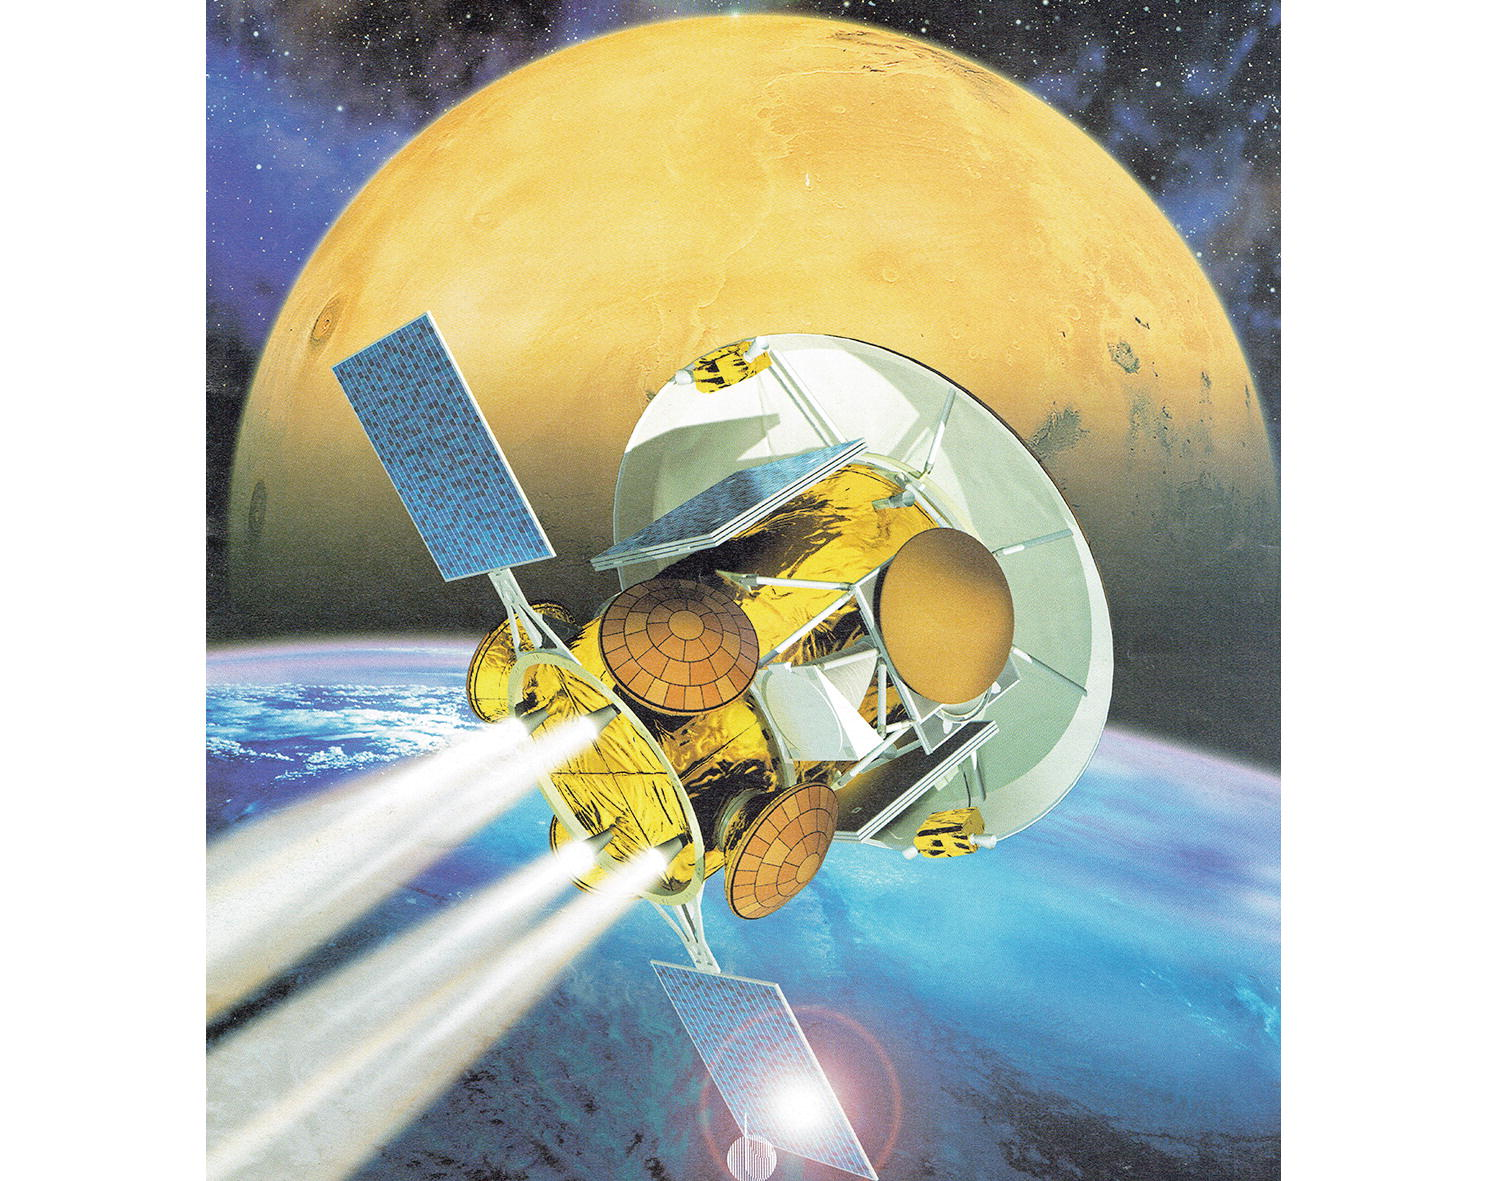 "*In EU* Set of 33 solar cell from Space USSR military satellite /""Molniya/"" Soviet"